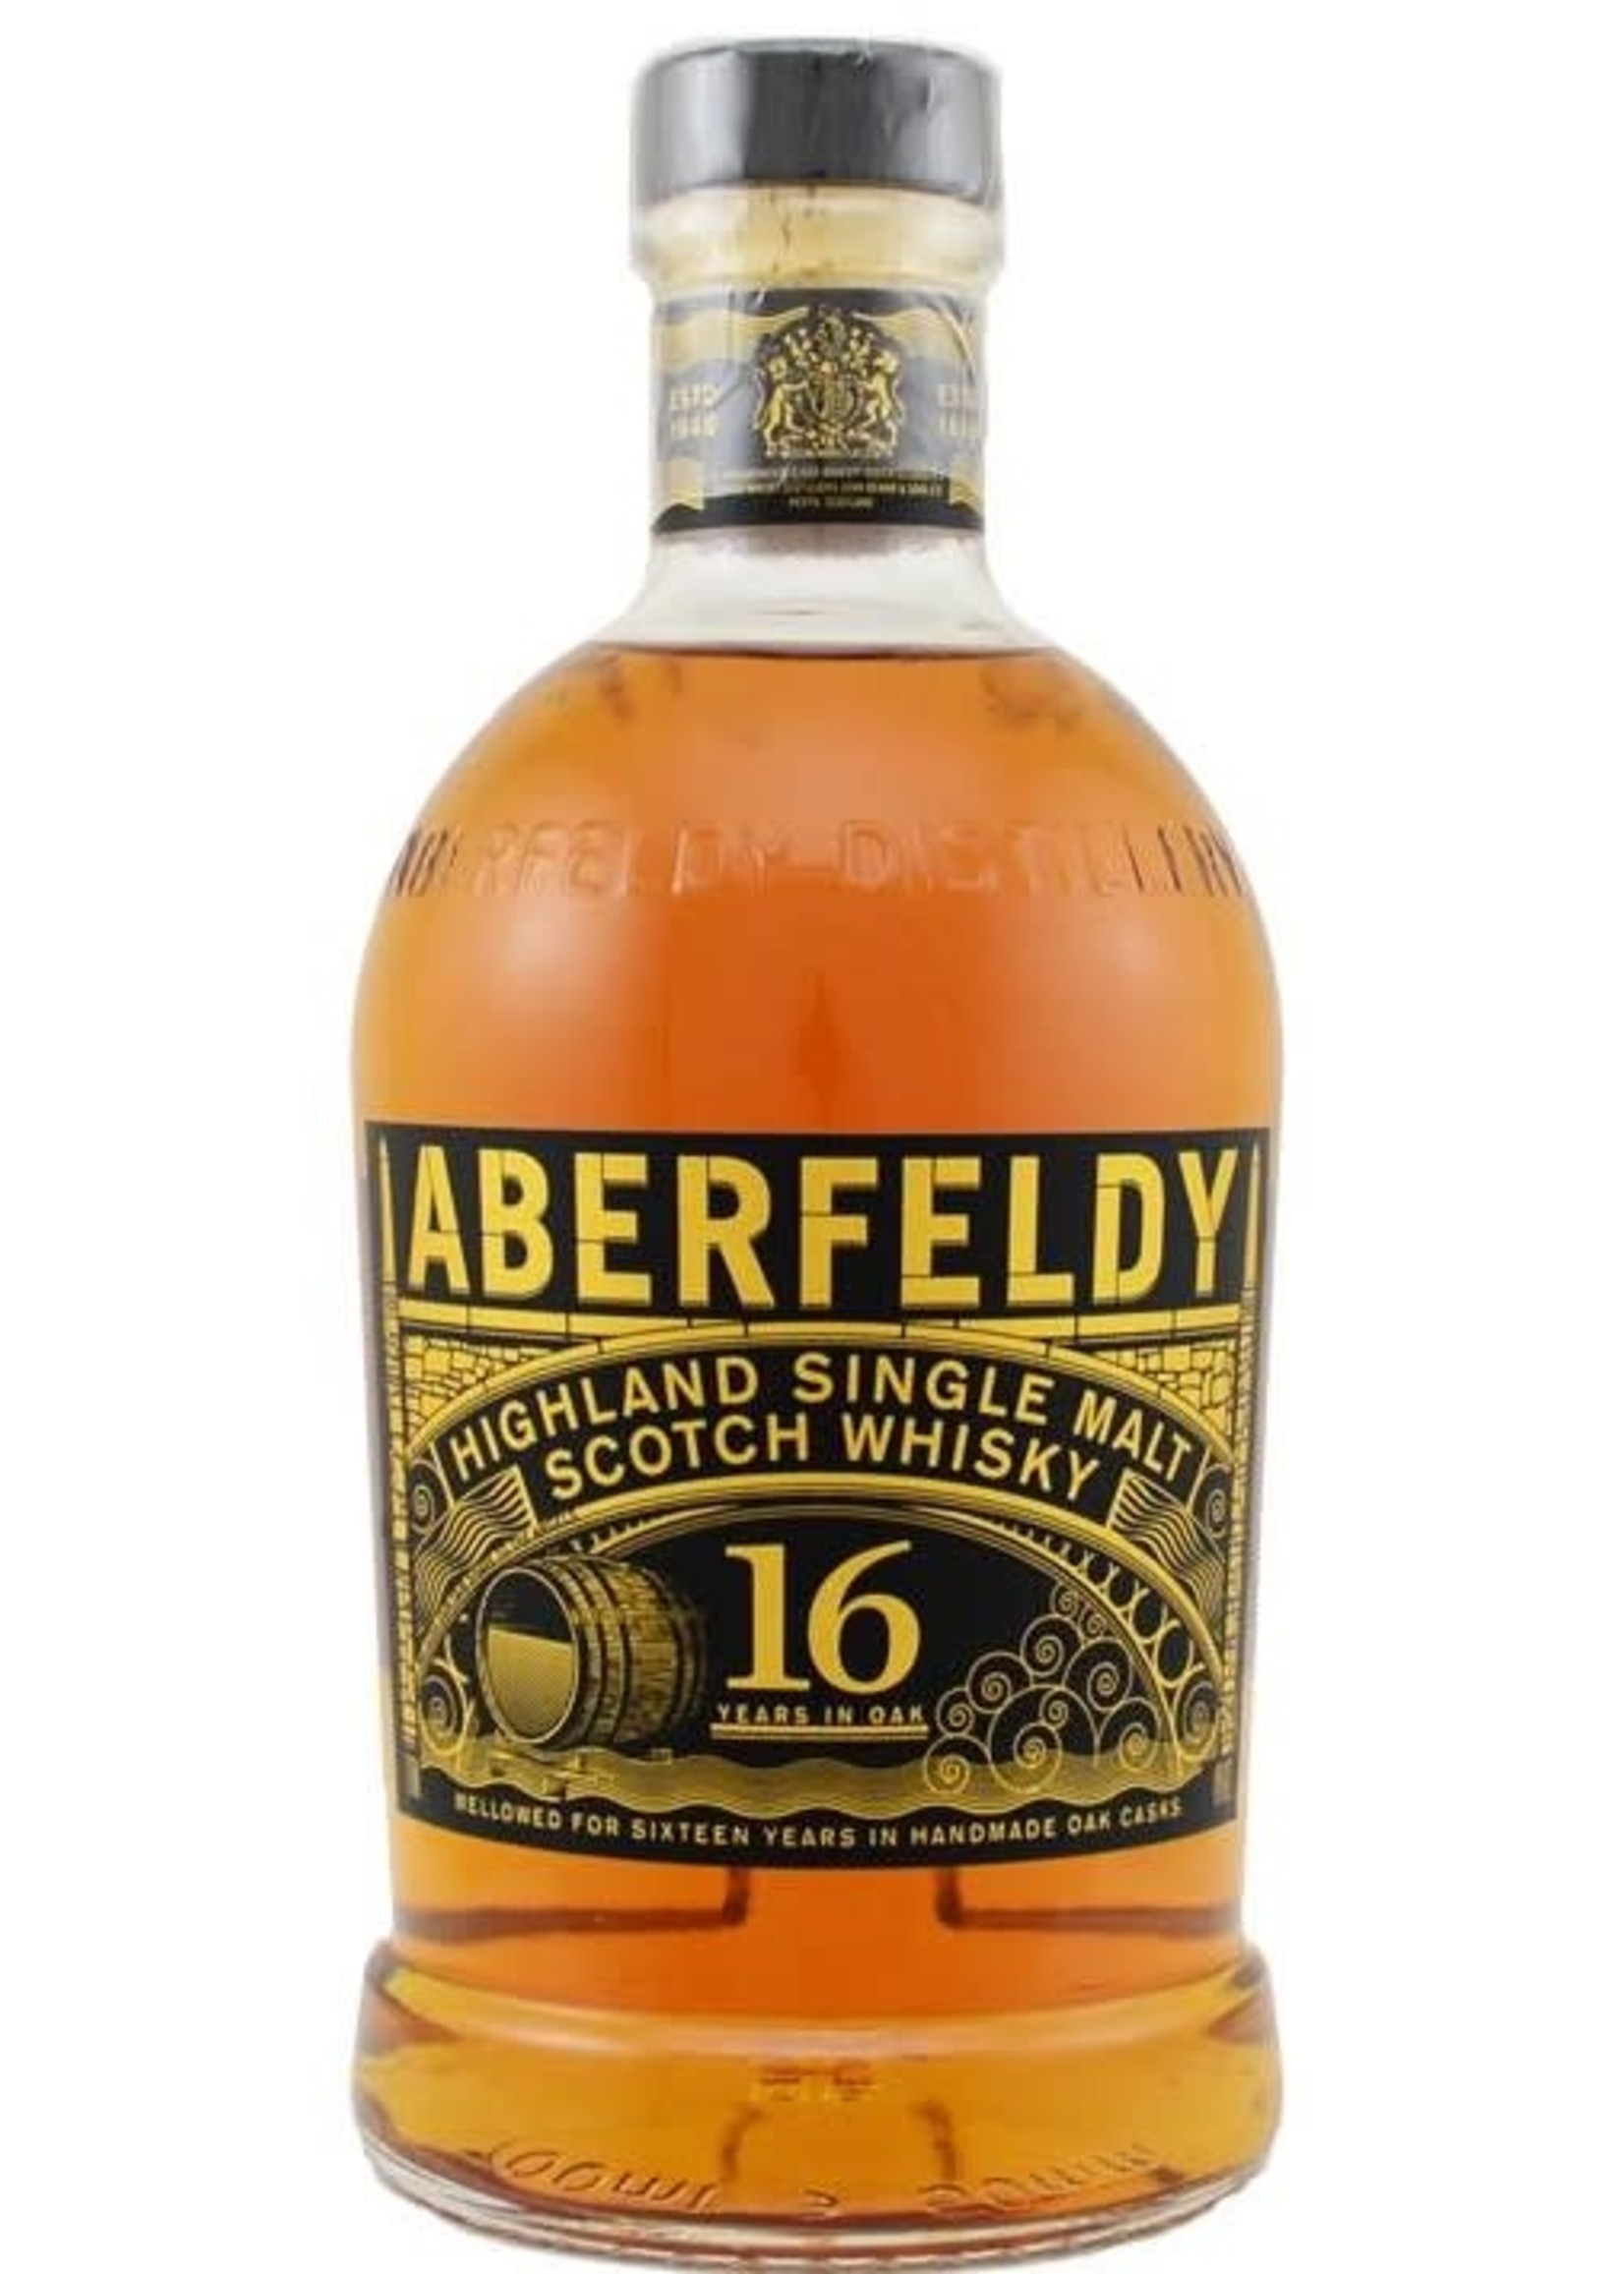 Aberfeldy Aberfeldy / 16 Year Single Malt Scotch / 750mL